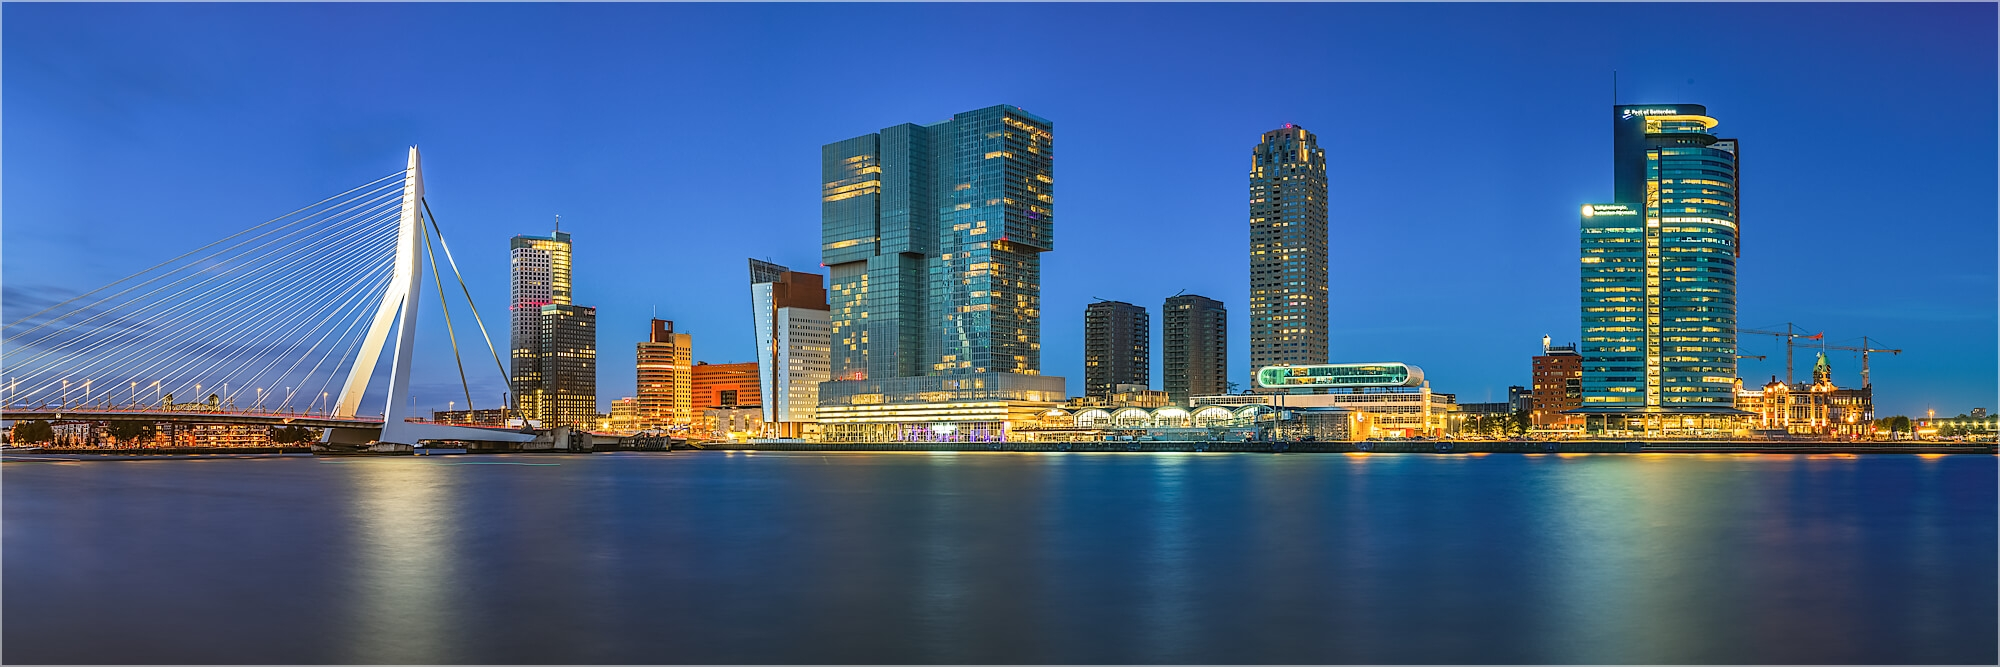 Panoramabild abendliche Skyline Rotterdam